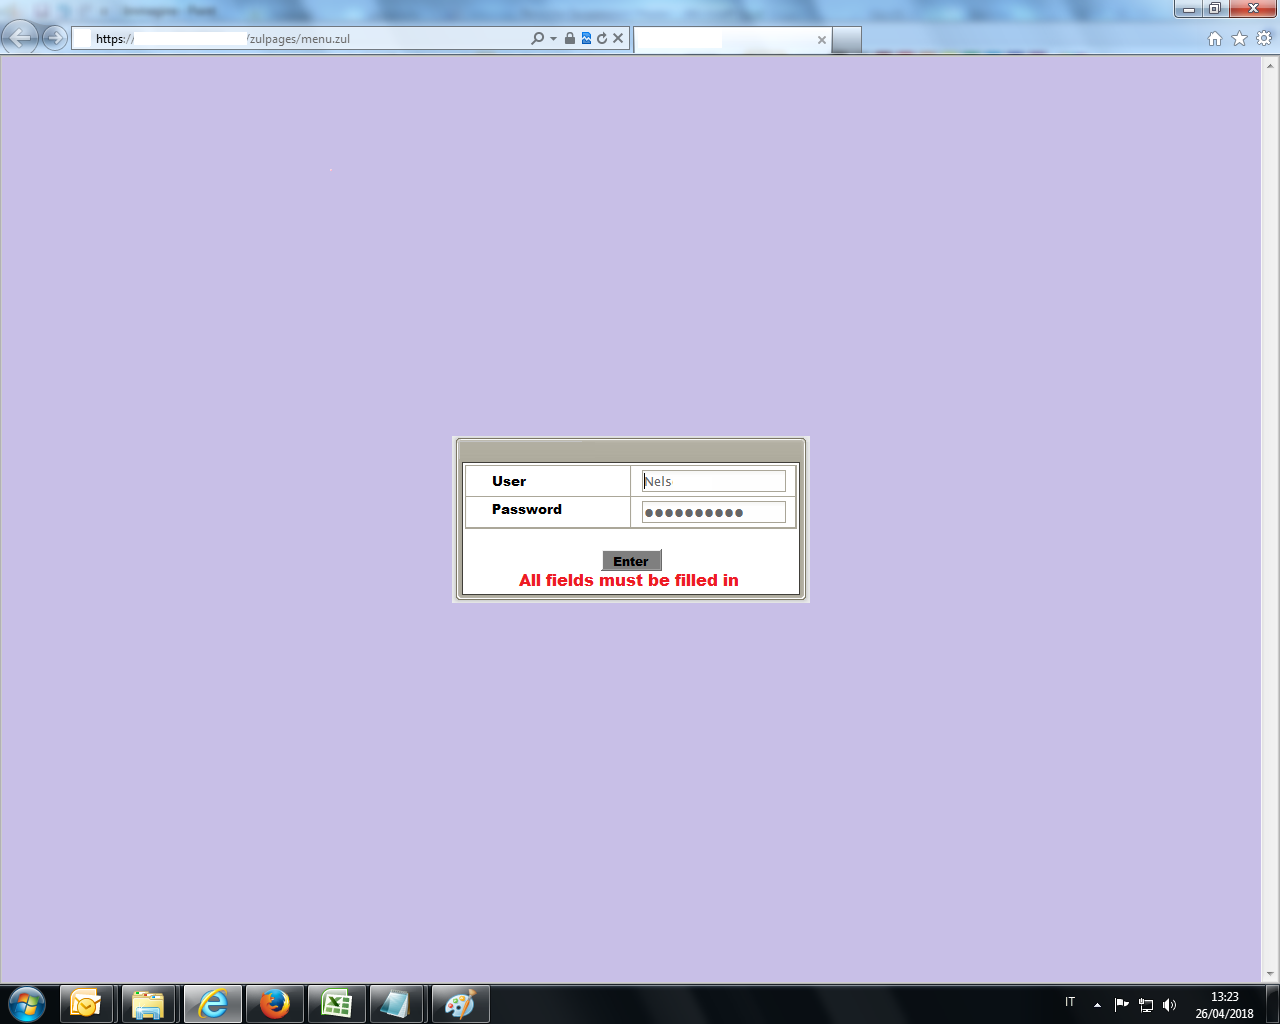 Automating Internet Explorer via Excel VBA: manage mouse events